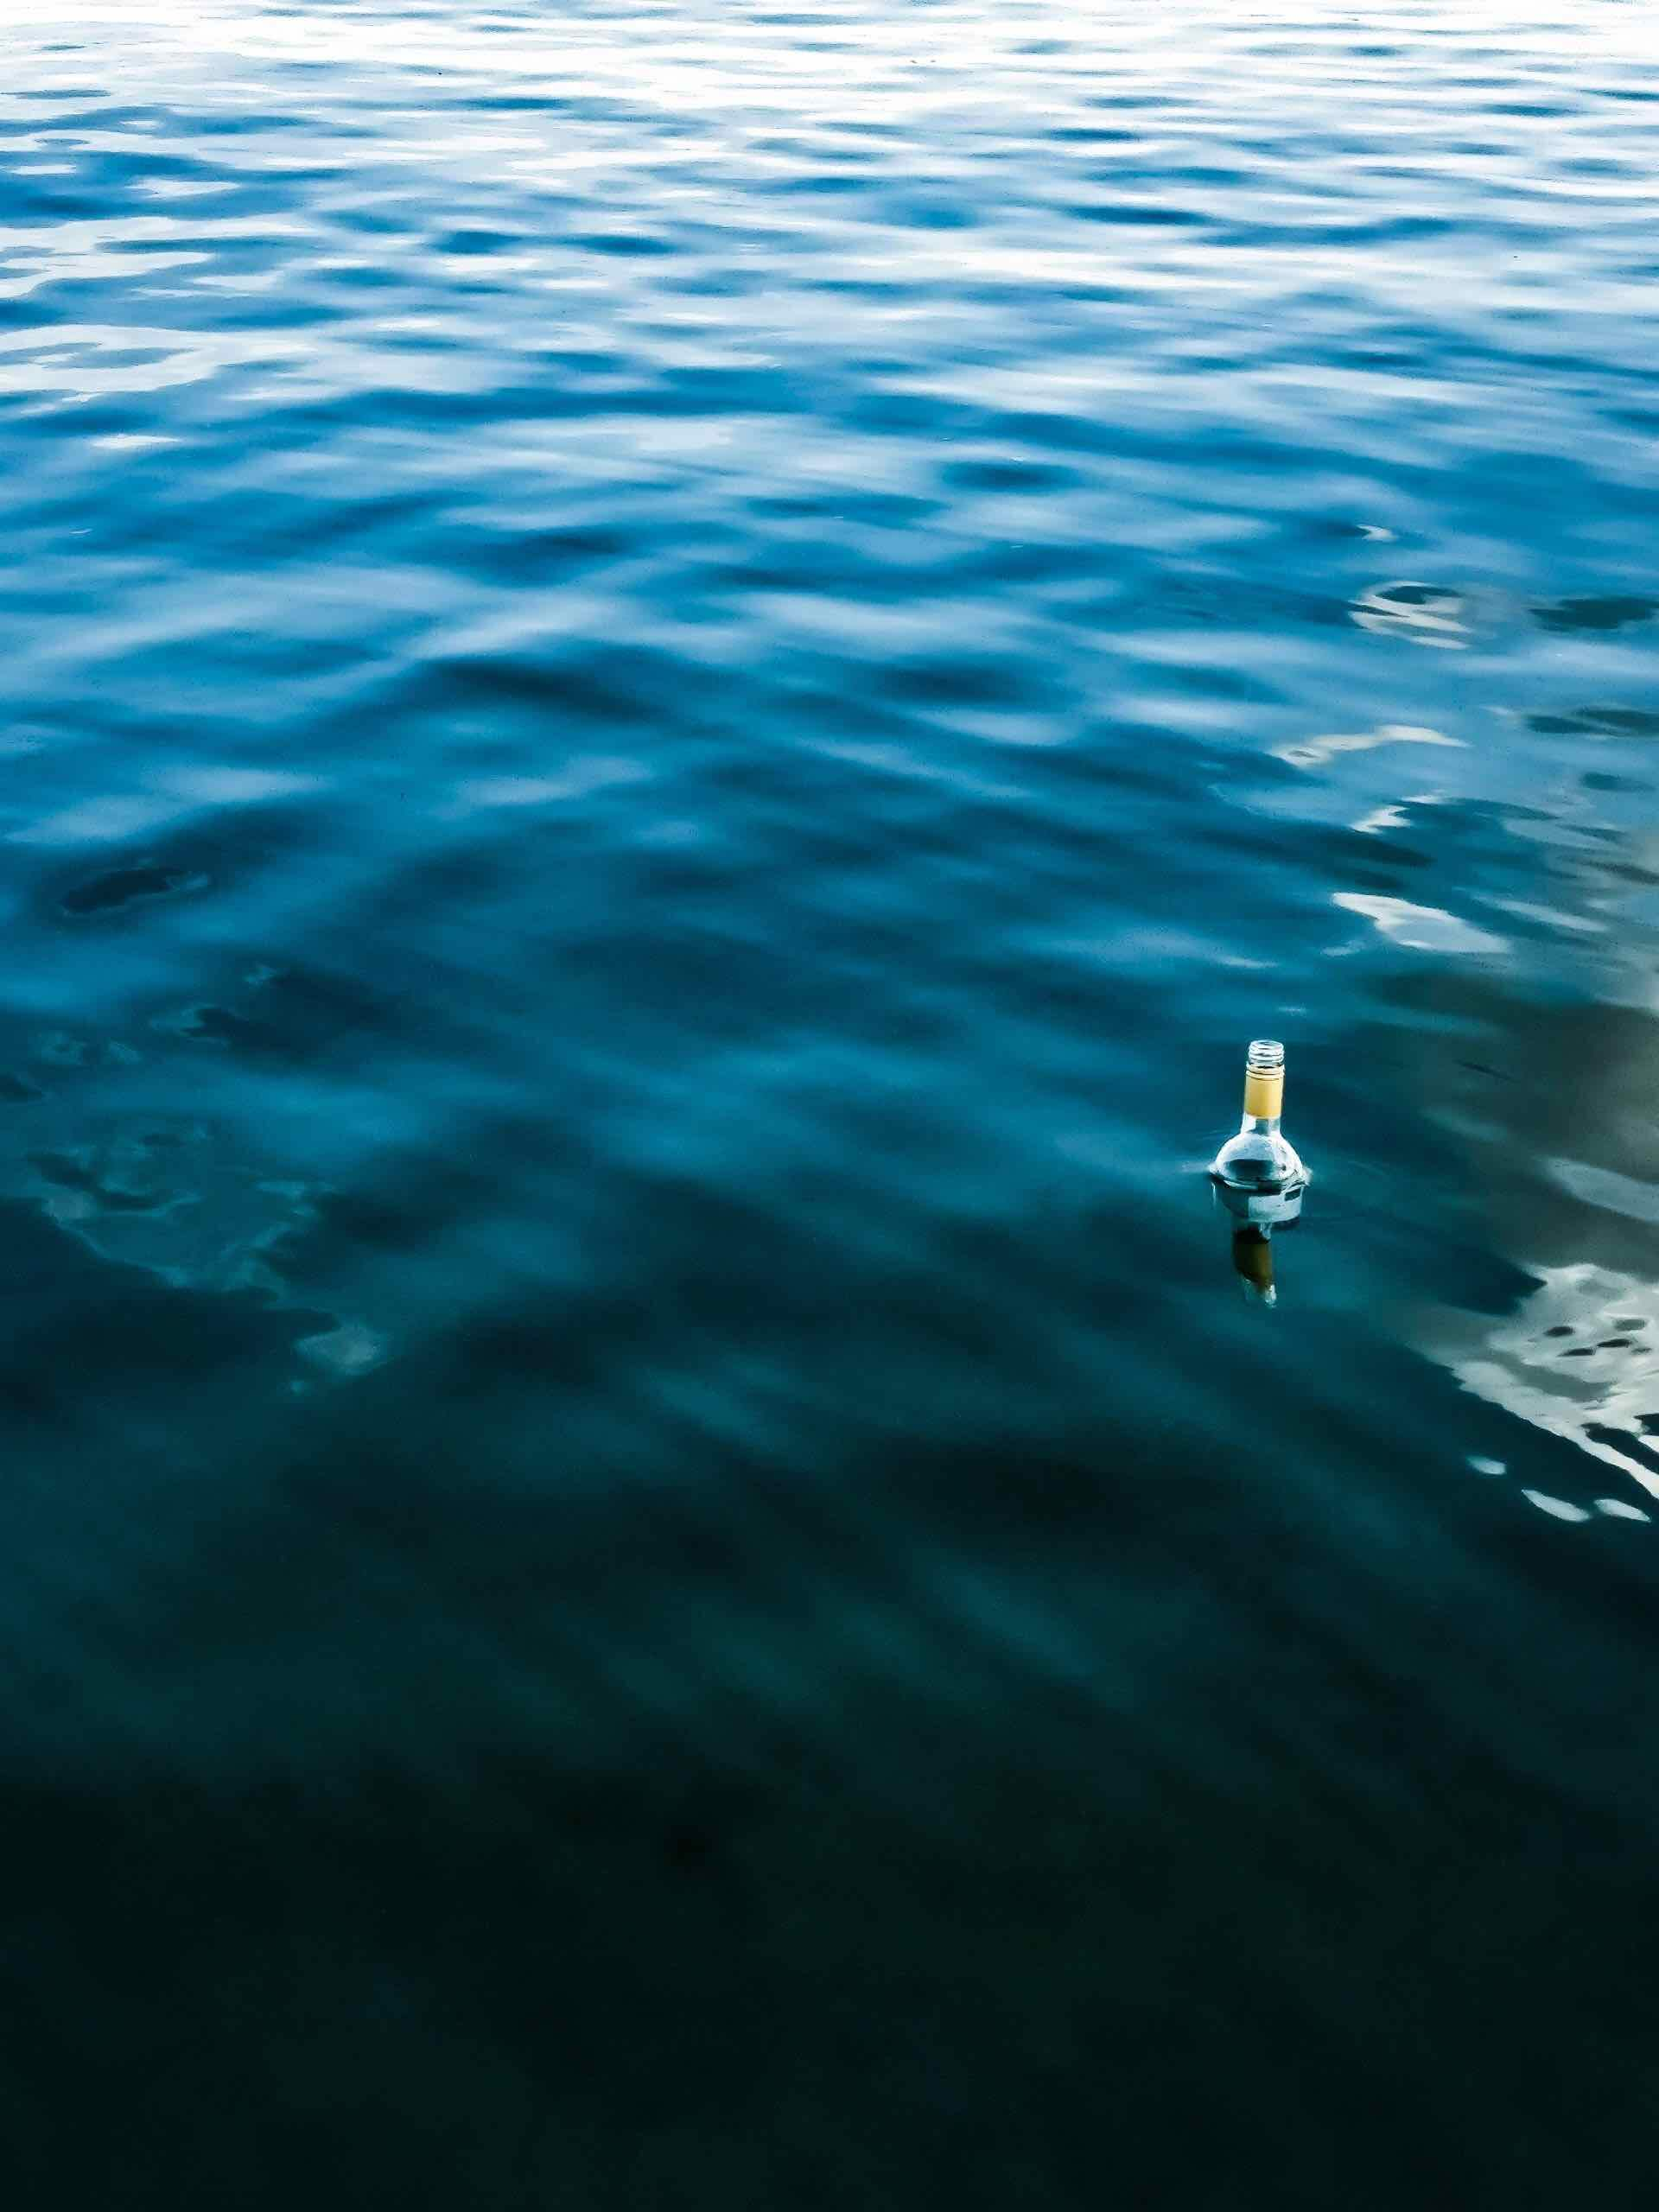 bouteille mer lettre océan bleu